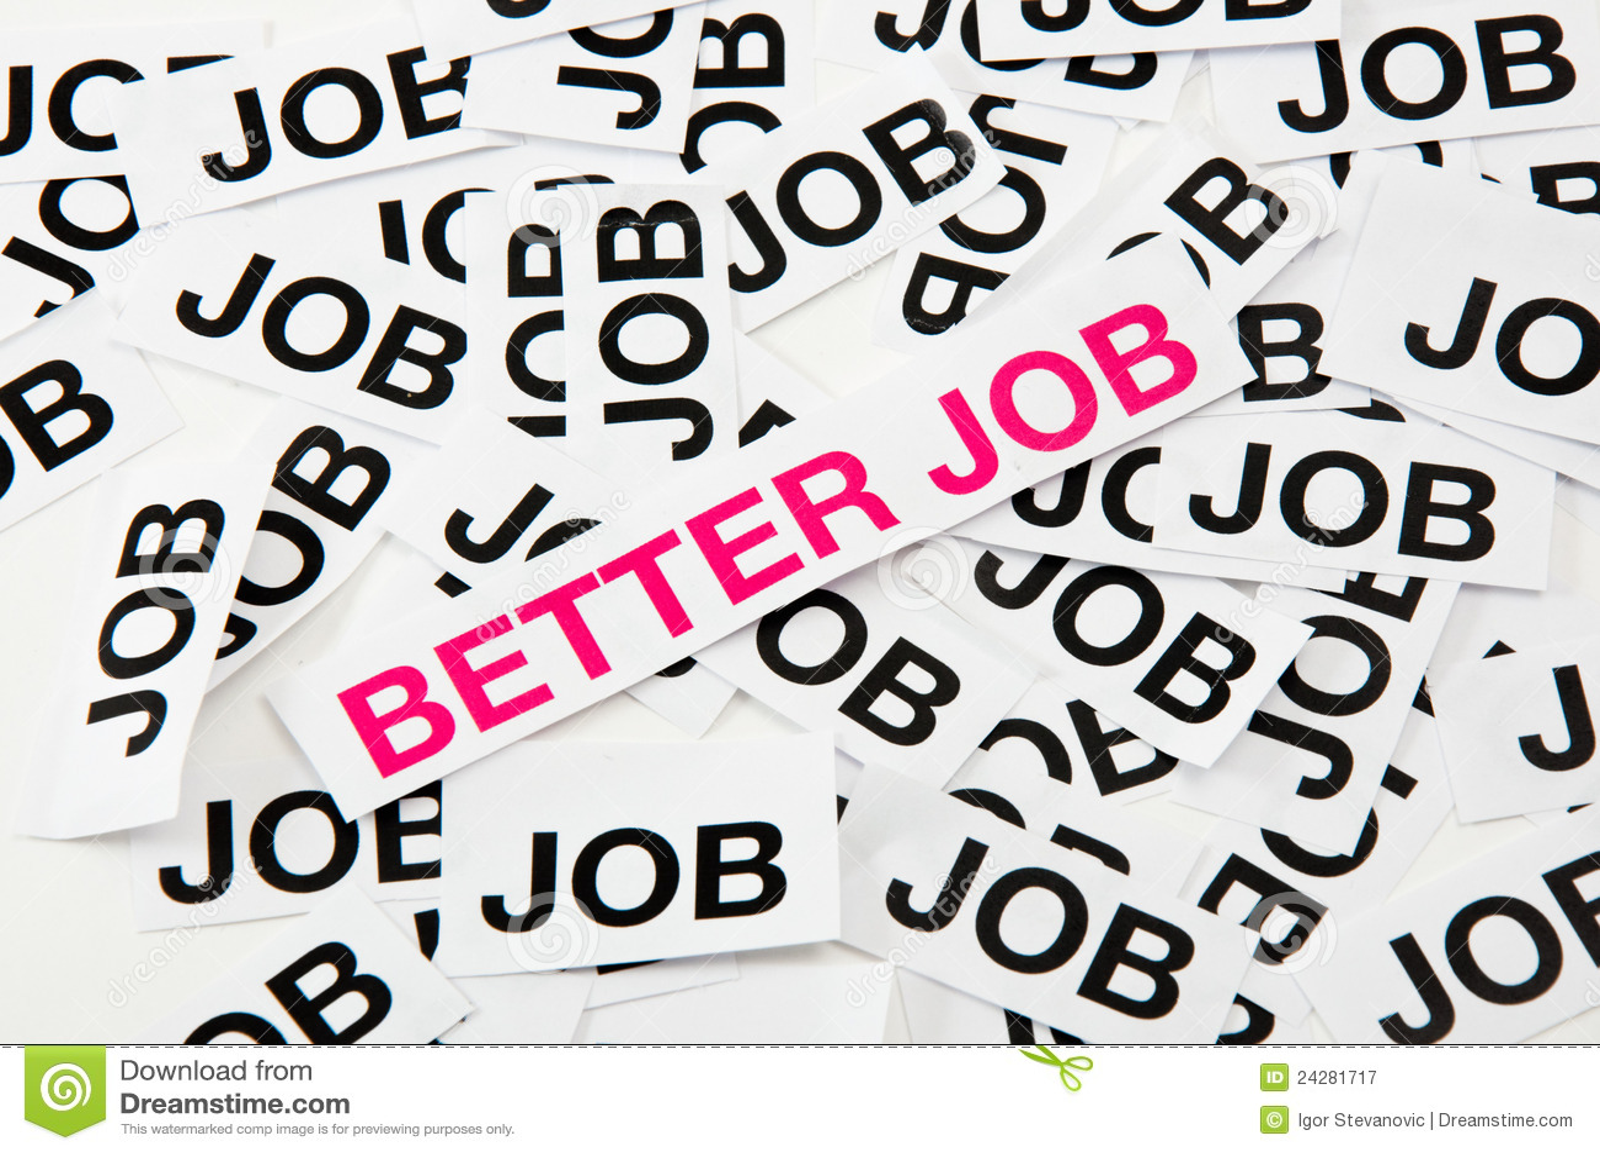 better job royalty stock photography image 24281717 better job